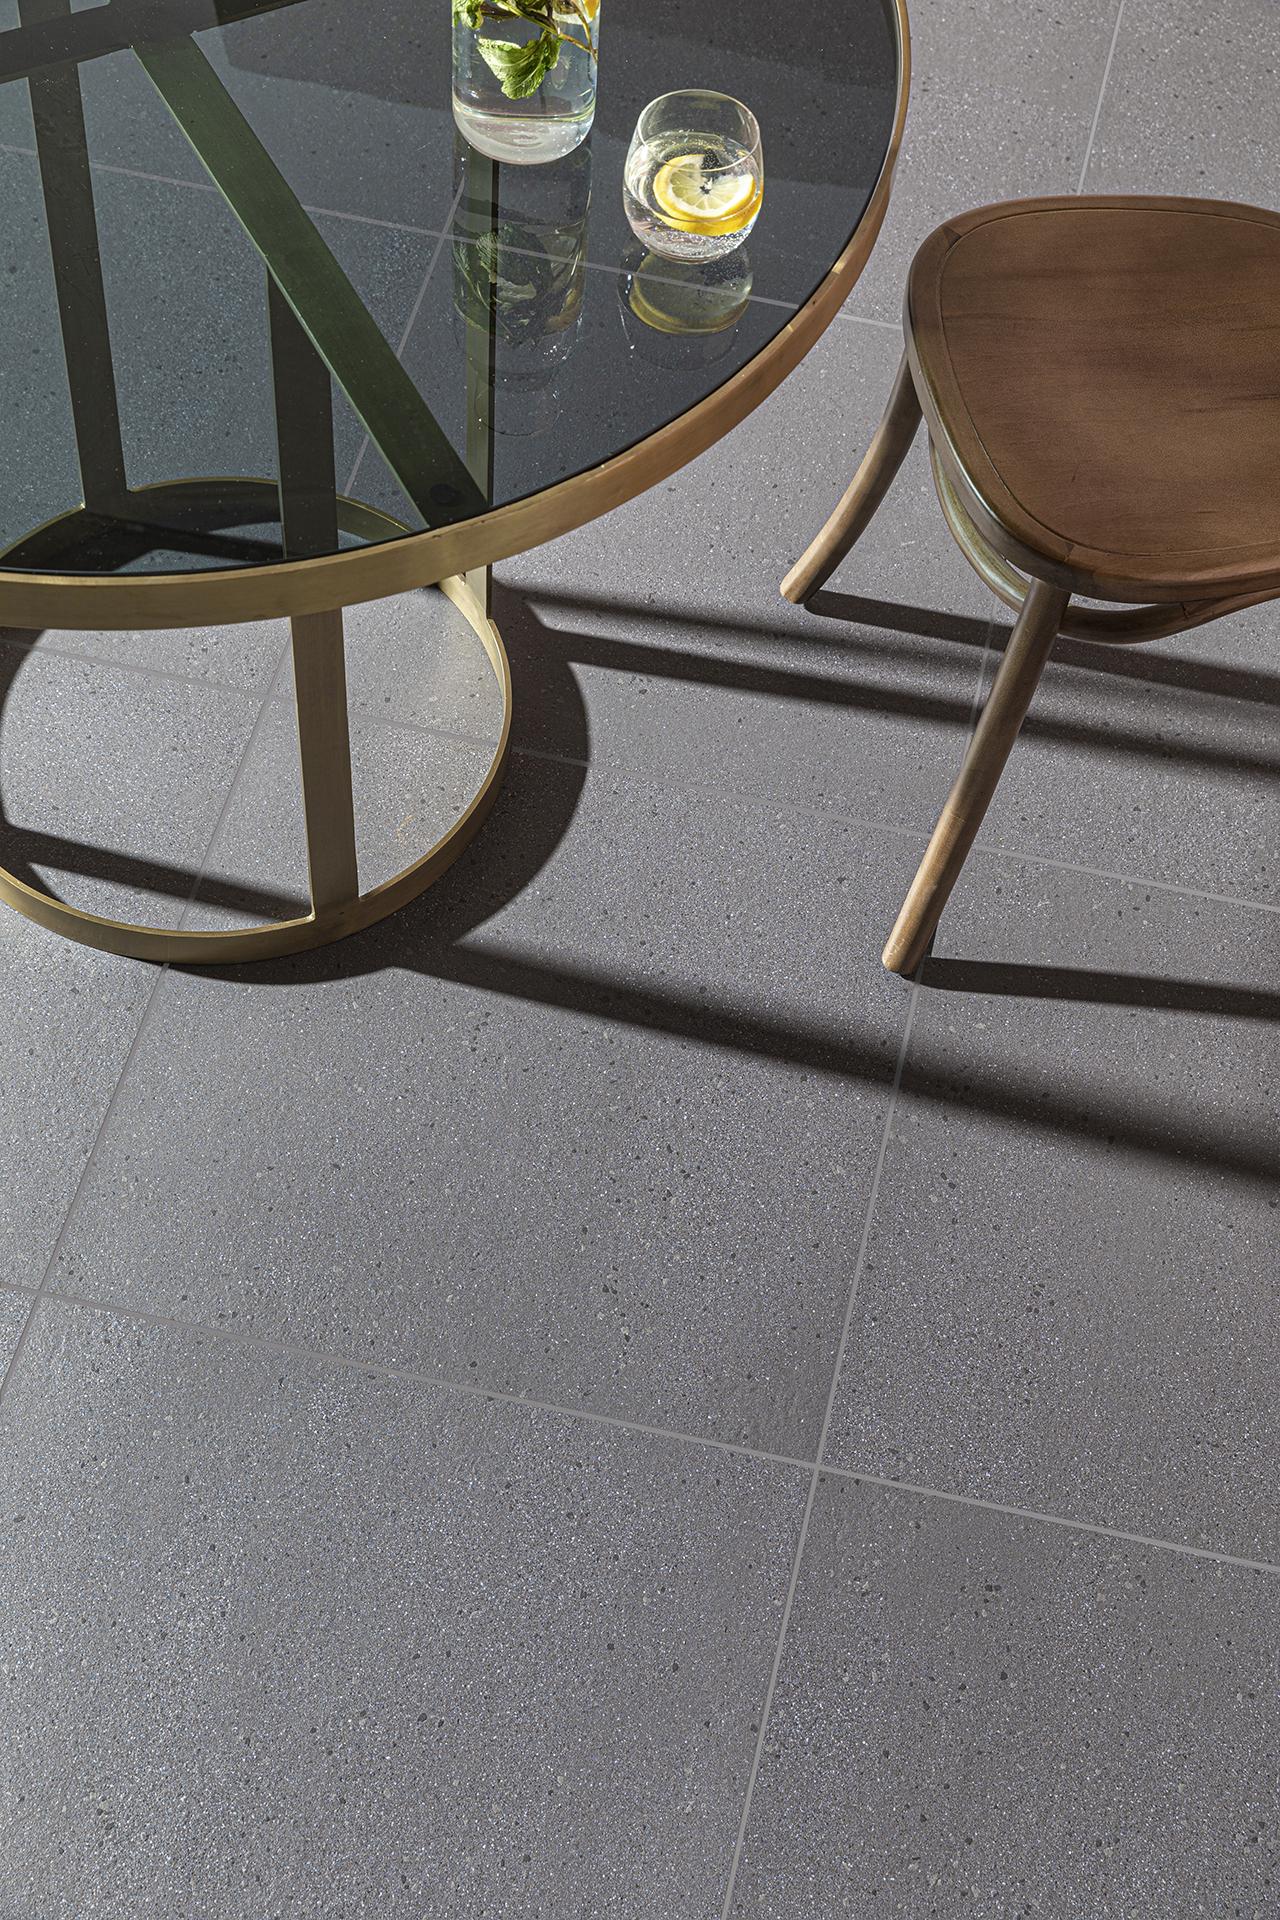 mosa-canvas-3512-hospitality-1-detail